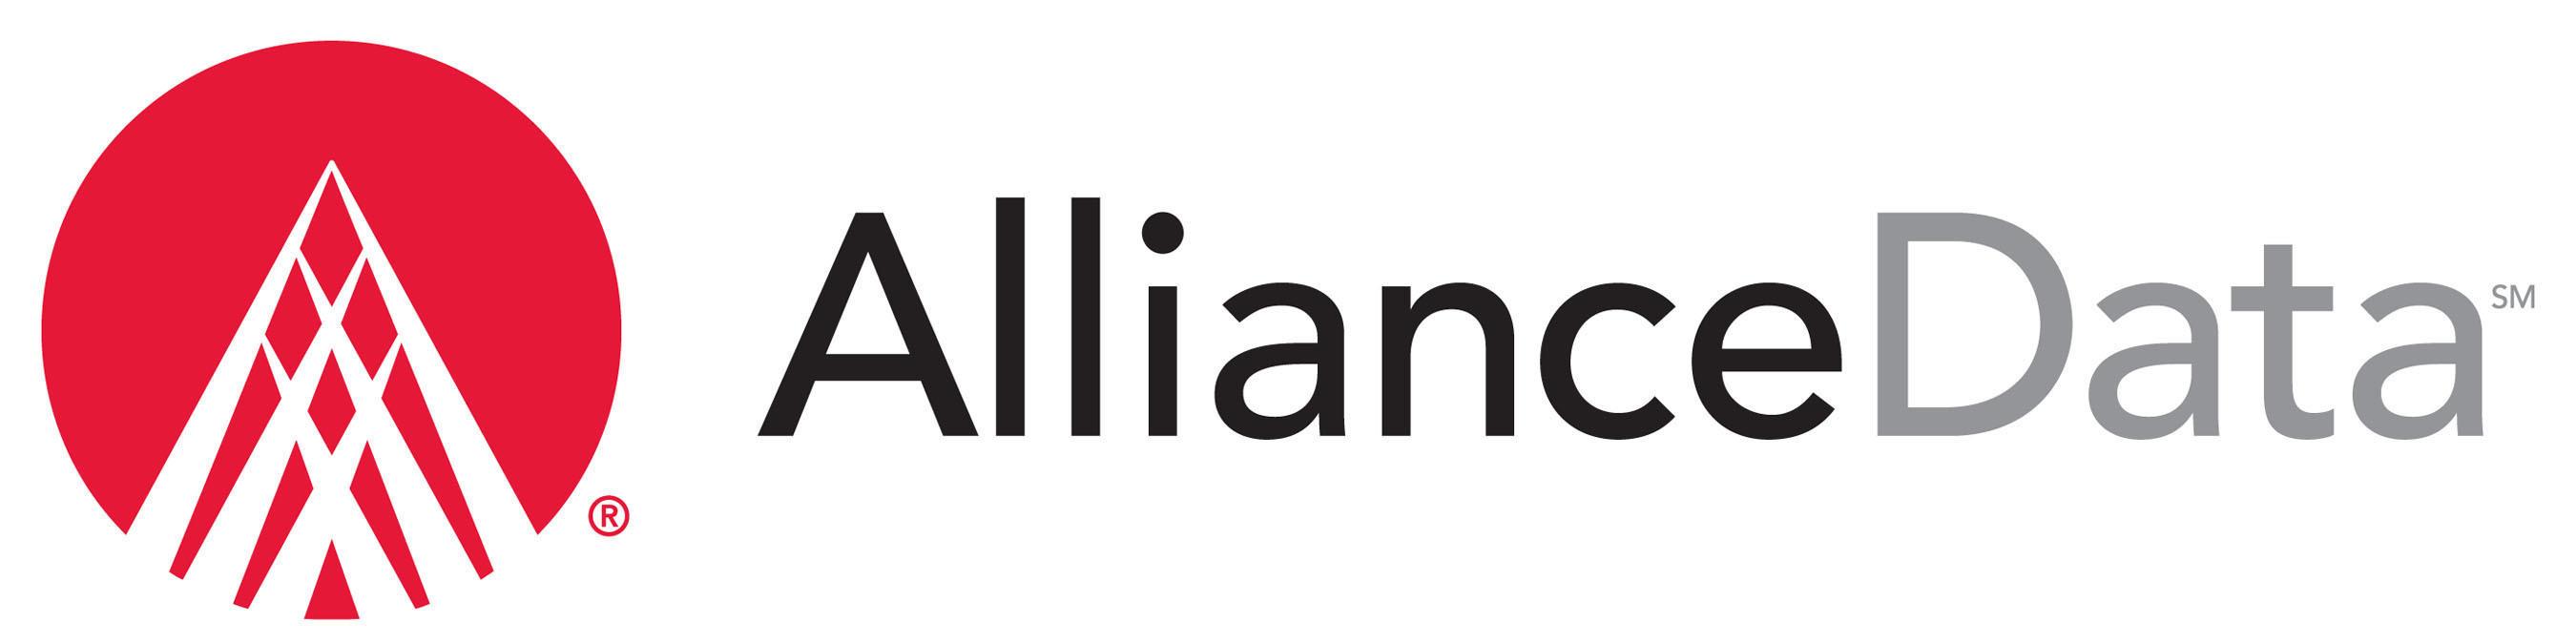 Alliance Data logo. (PRNewsFoto)